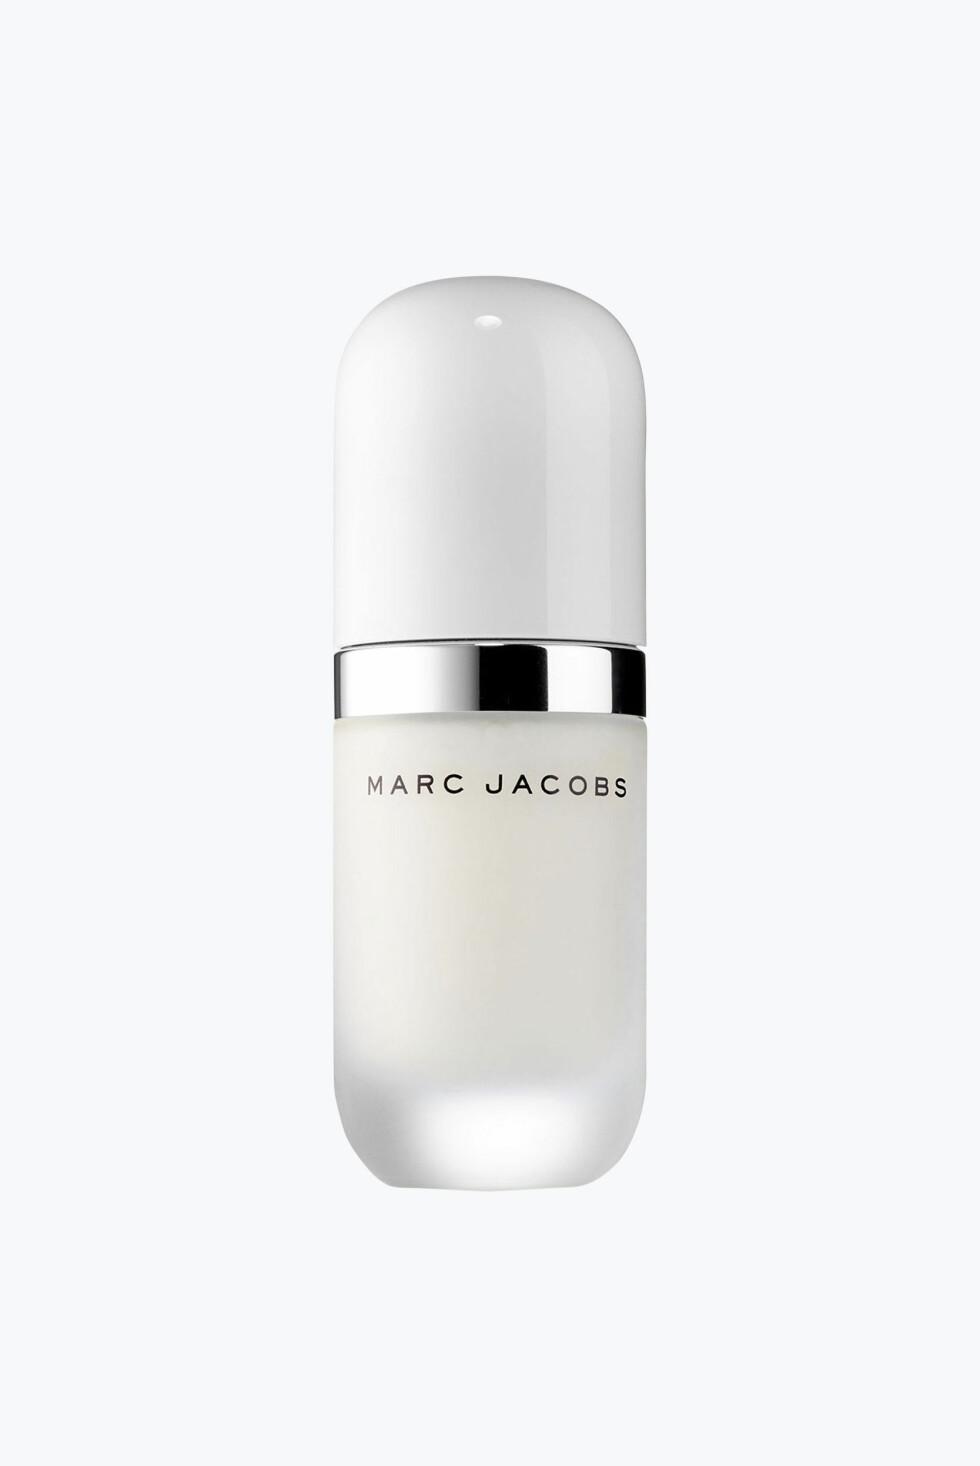 Primer (kr450, Marc Jacobs Beauty, Coconut Primer).